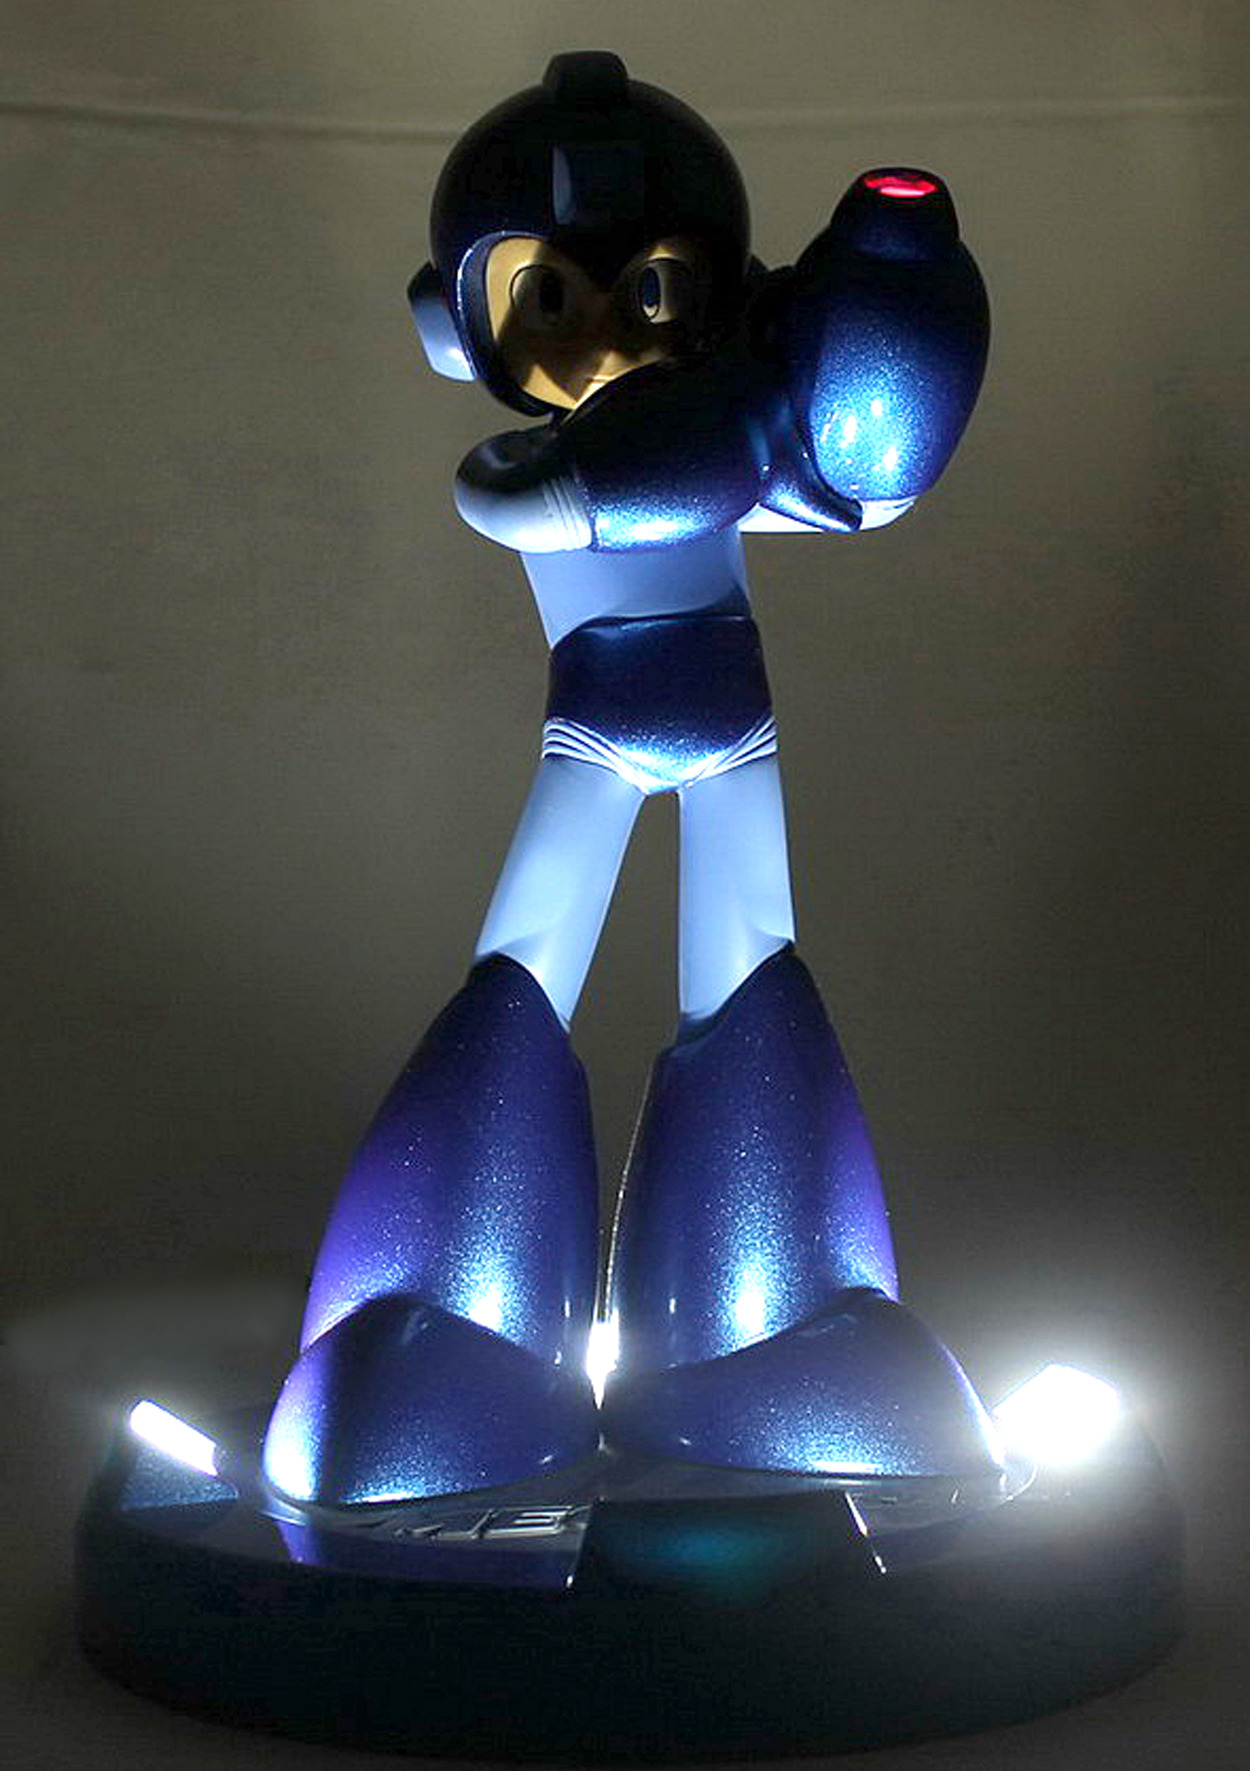 25th anniversary Mega Man statue 25-04-13-004